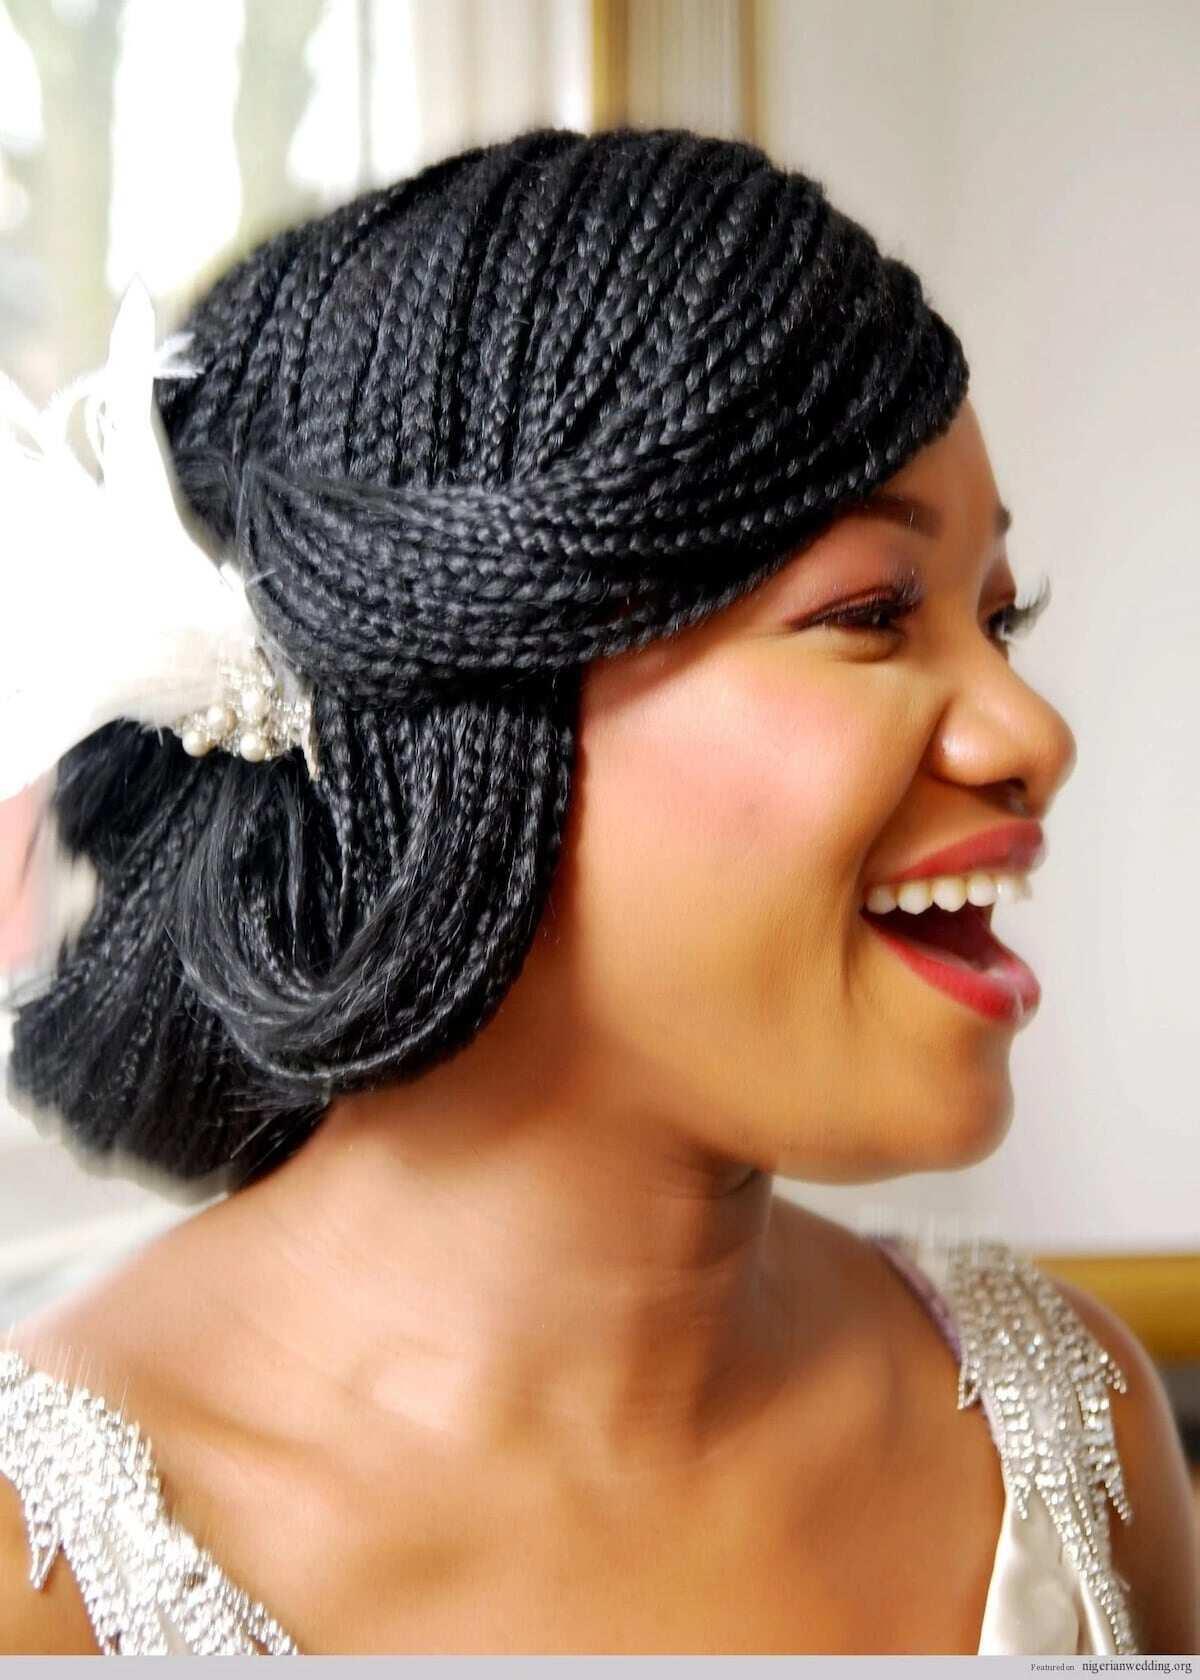 nigerian bridal braids hairstyles, Nigerian braids hairstyles, simple nigerian braids hairstyles